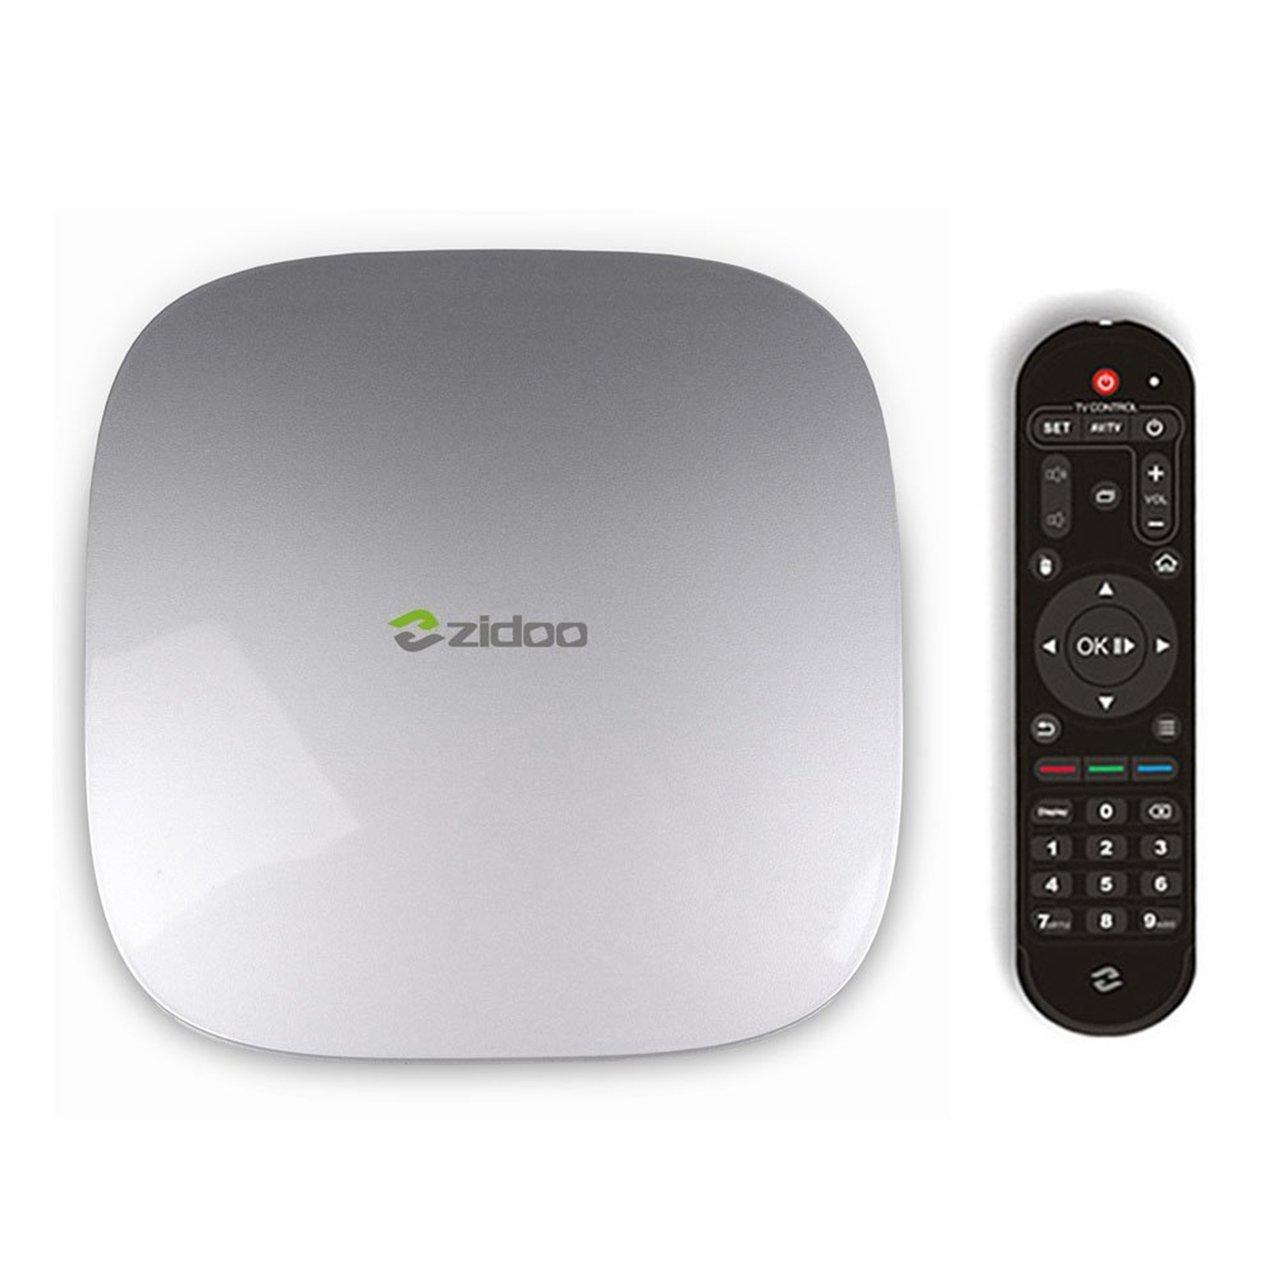 Zidoo X5 TV Box Driver for Windows Mac